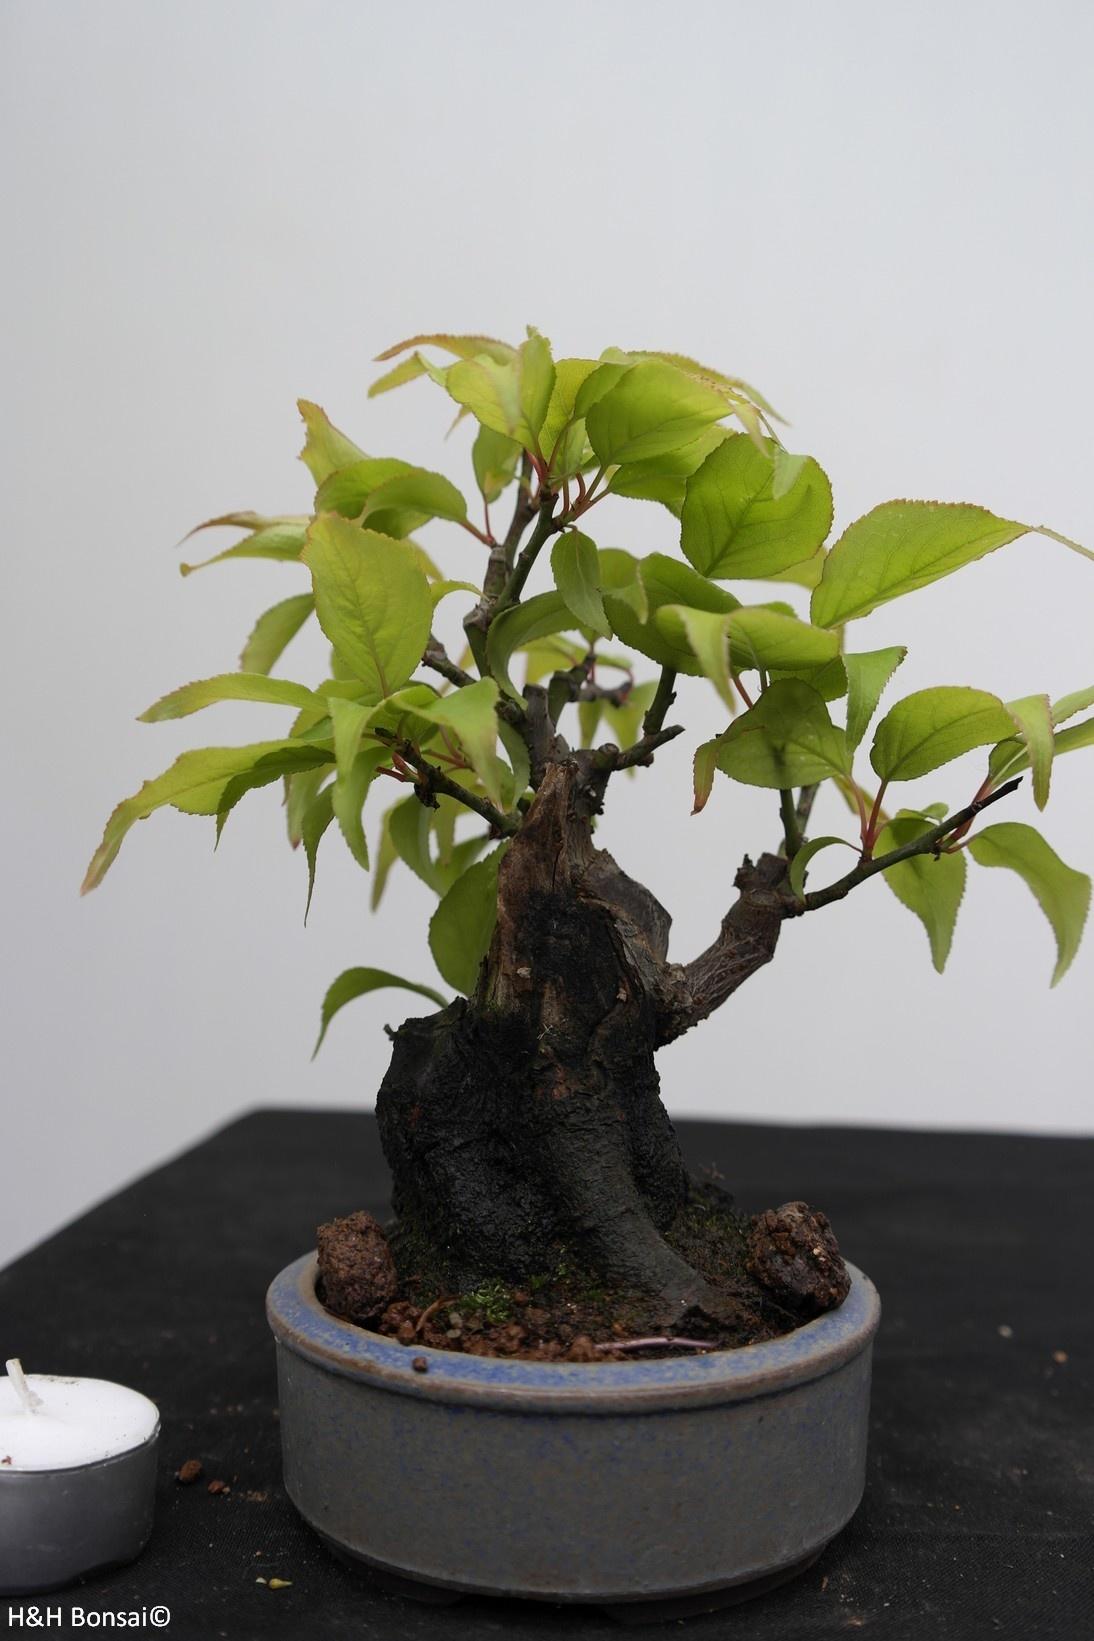 Bonsai Shohin di Albicocco giapponese, Prunus mume, no. 7779